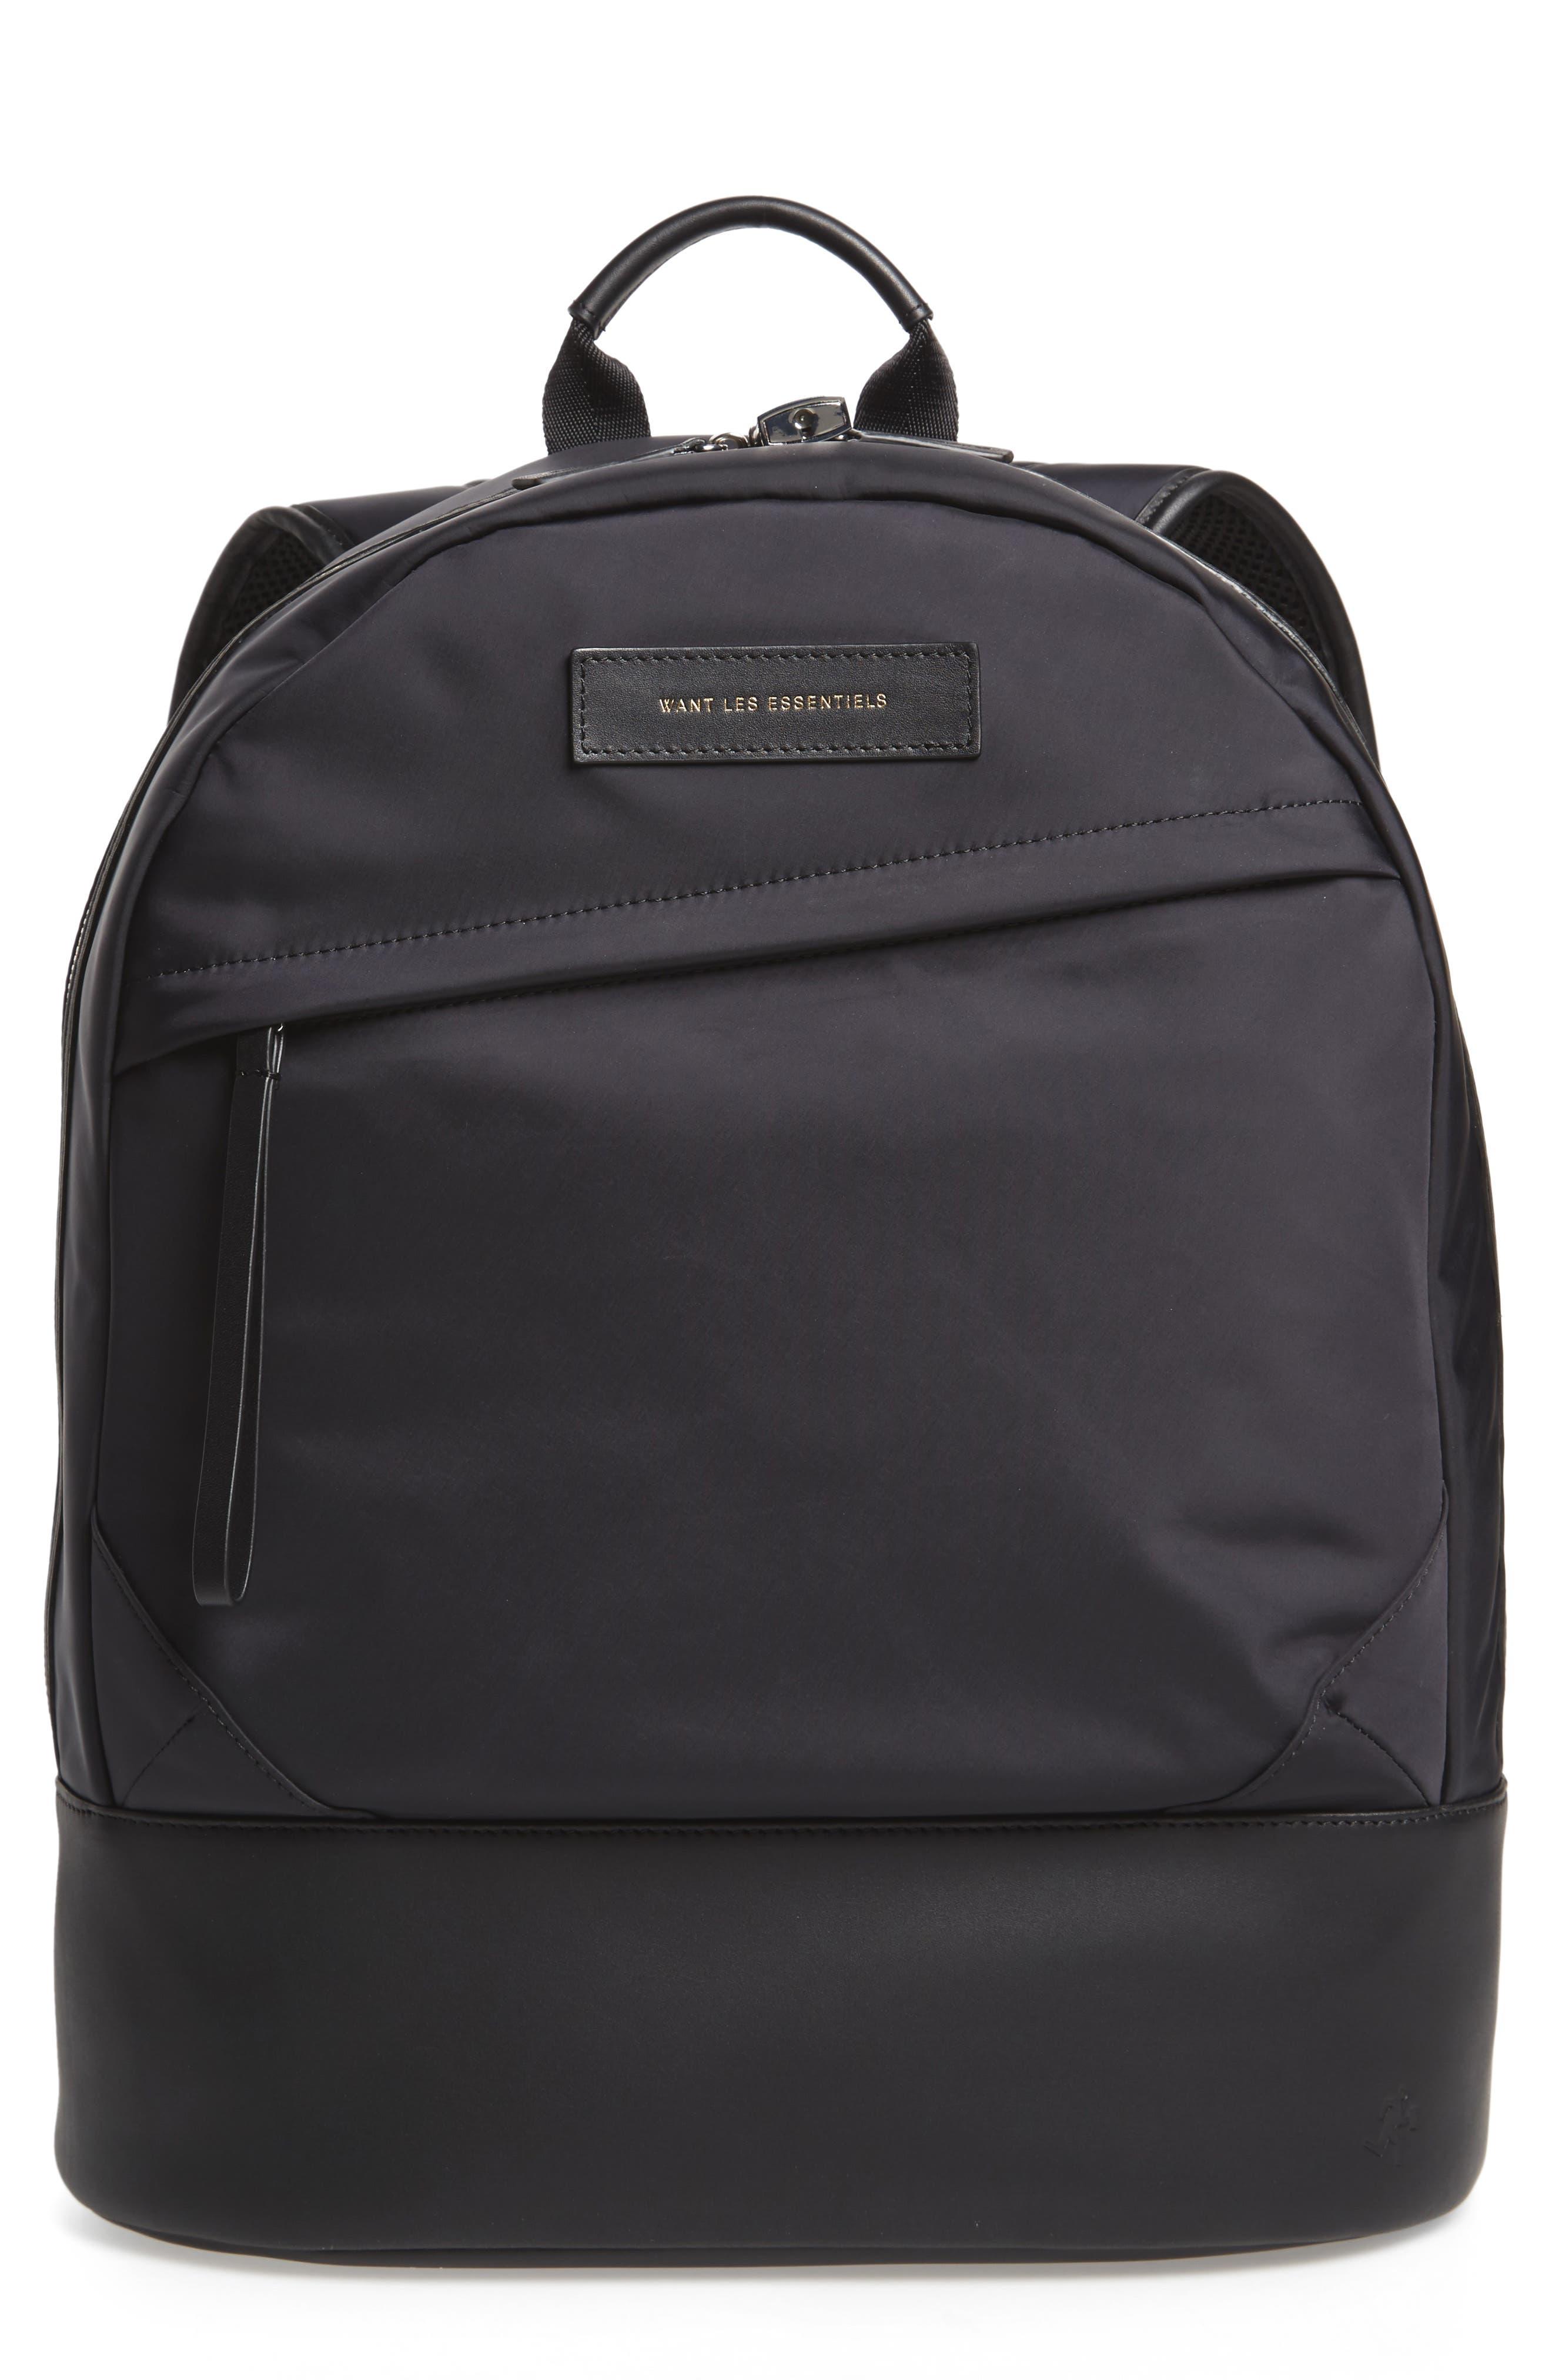 WANT LES ESSENTIELS 'Kastrup' Backpack, Main, color, 002